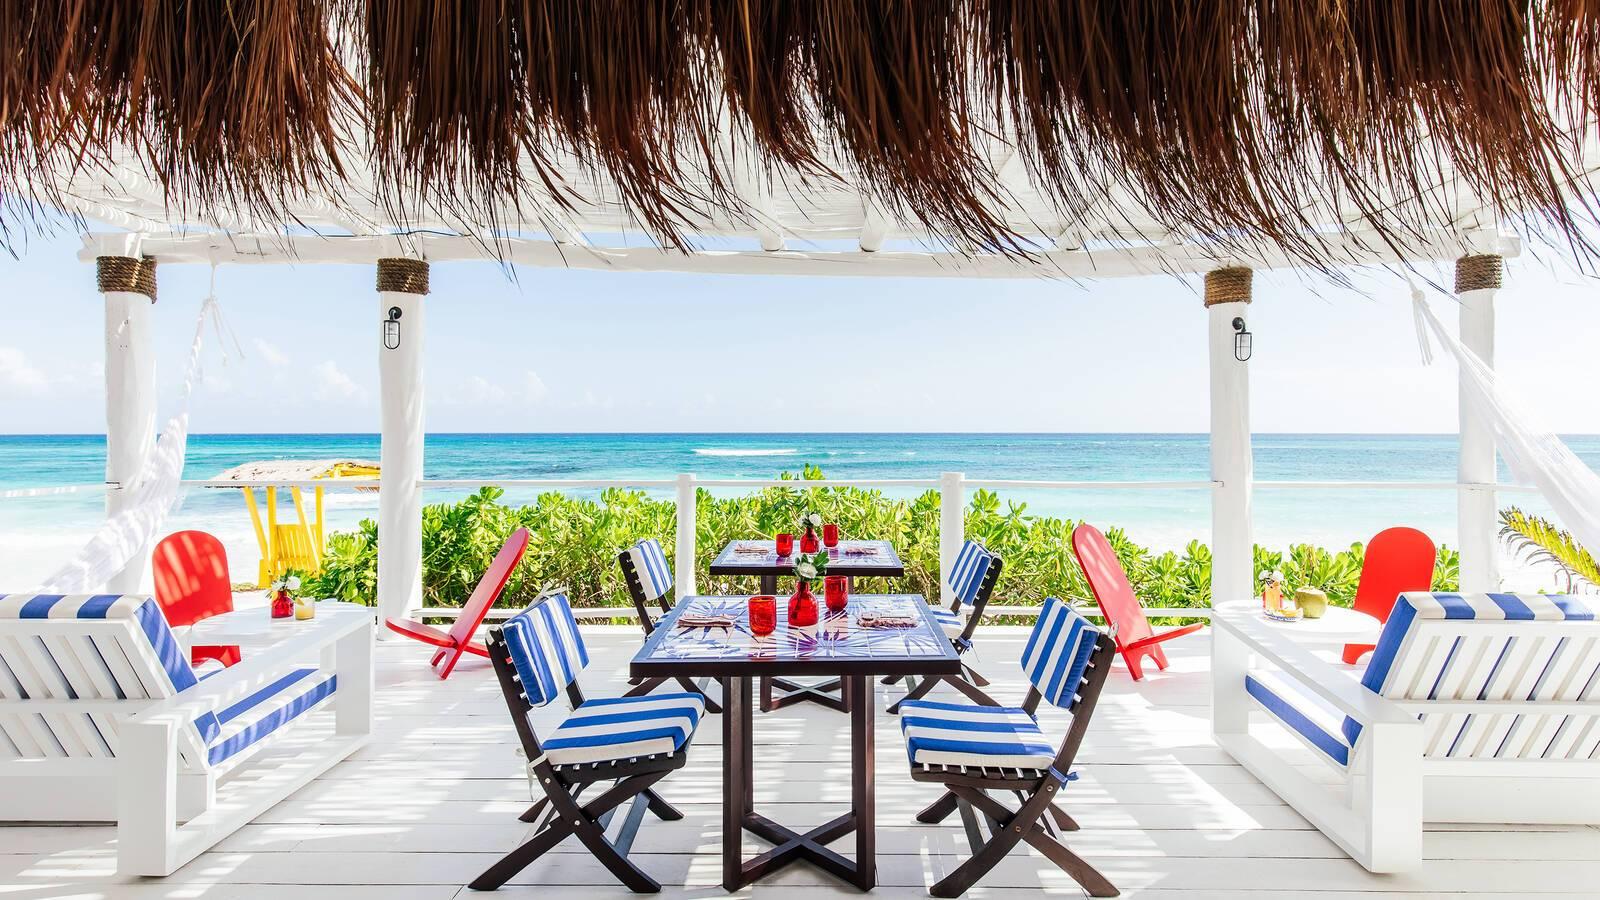 Esencia Mexique Beach Palapa Restaurant